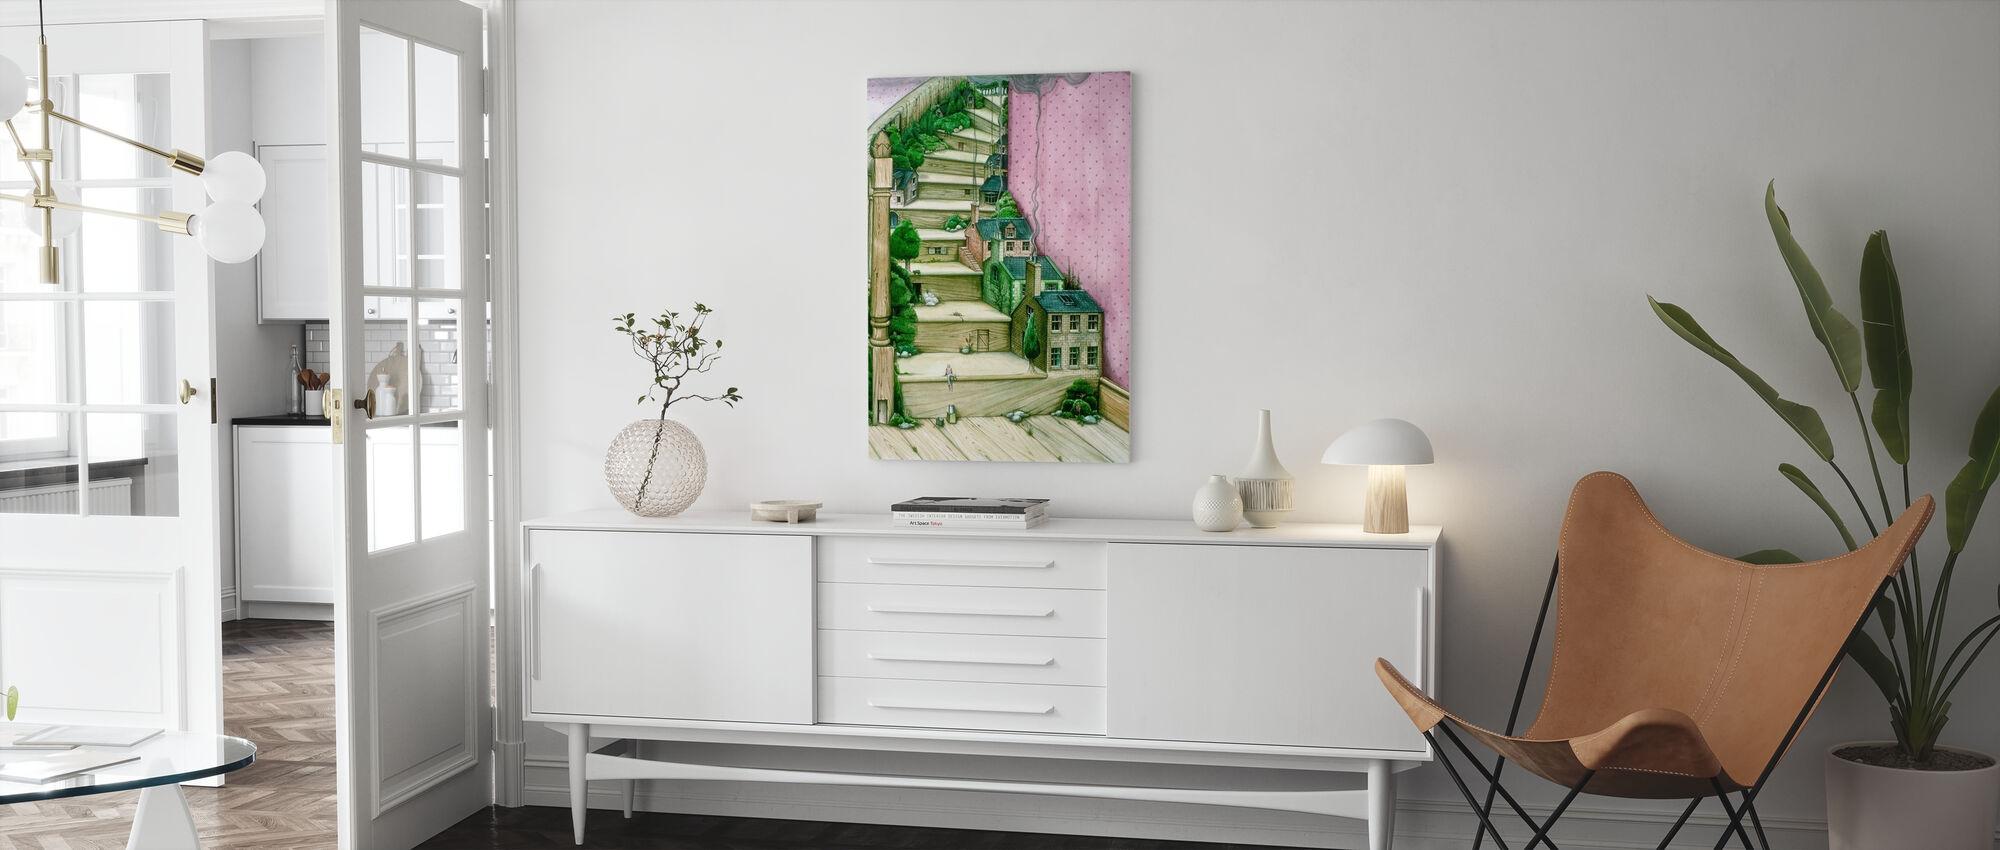 Levande Trappor - Canvastavla - Vardagsrum